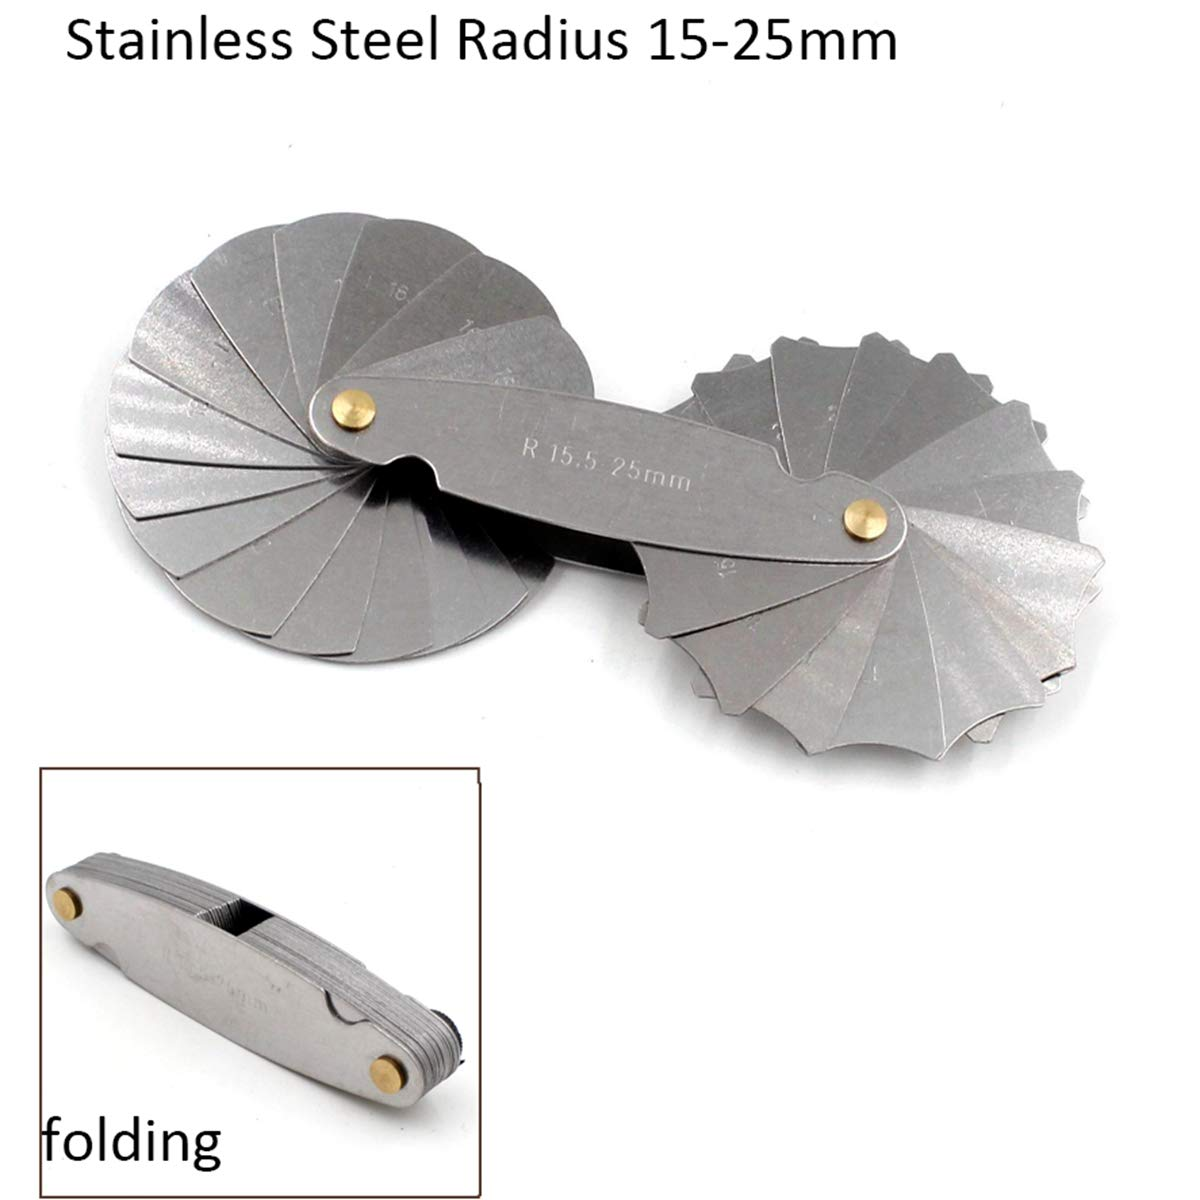 Foldable 32 Blades Stainless Steel Radius Gauge R15-25mm Metric Measuring Tool